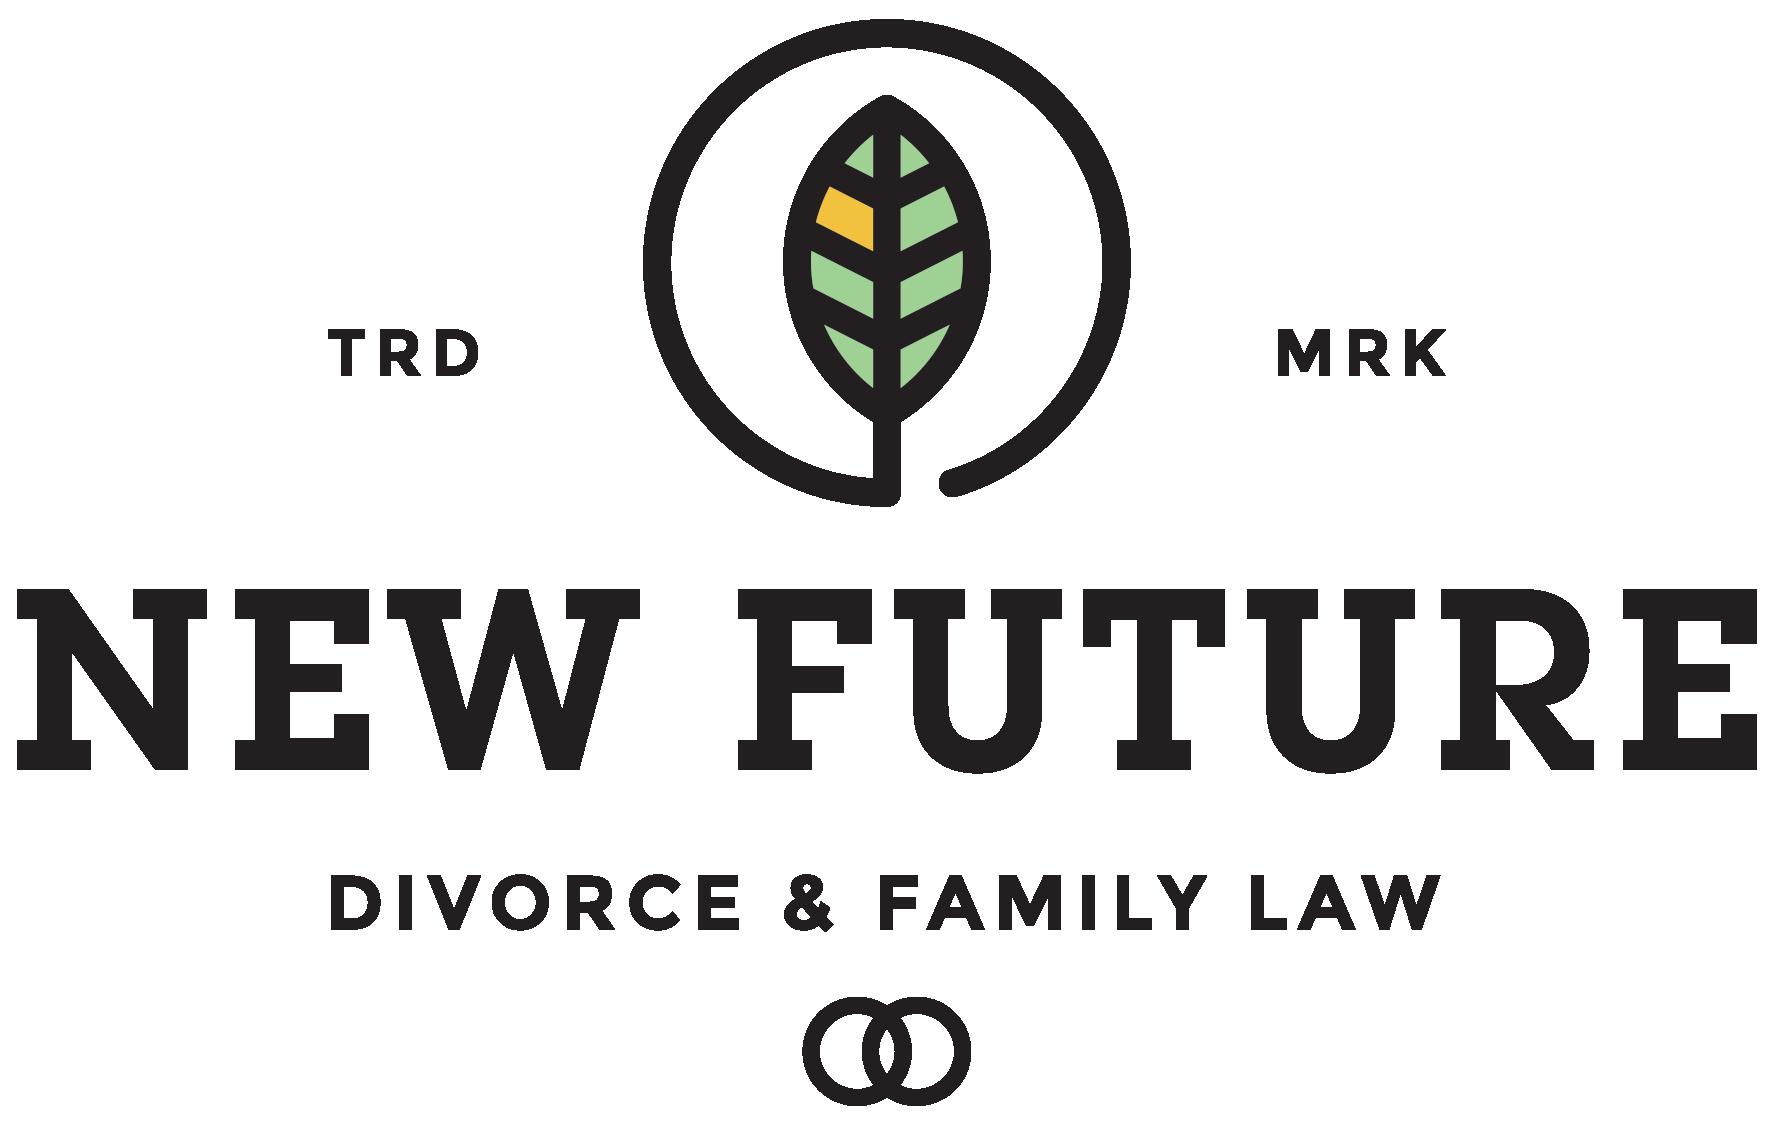 KLF Law Firm